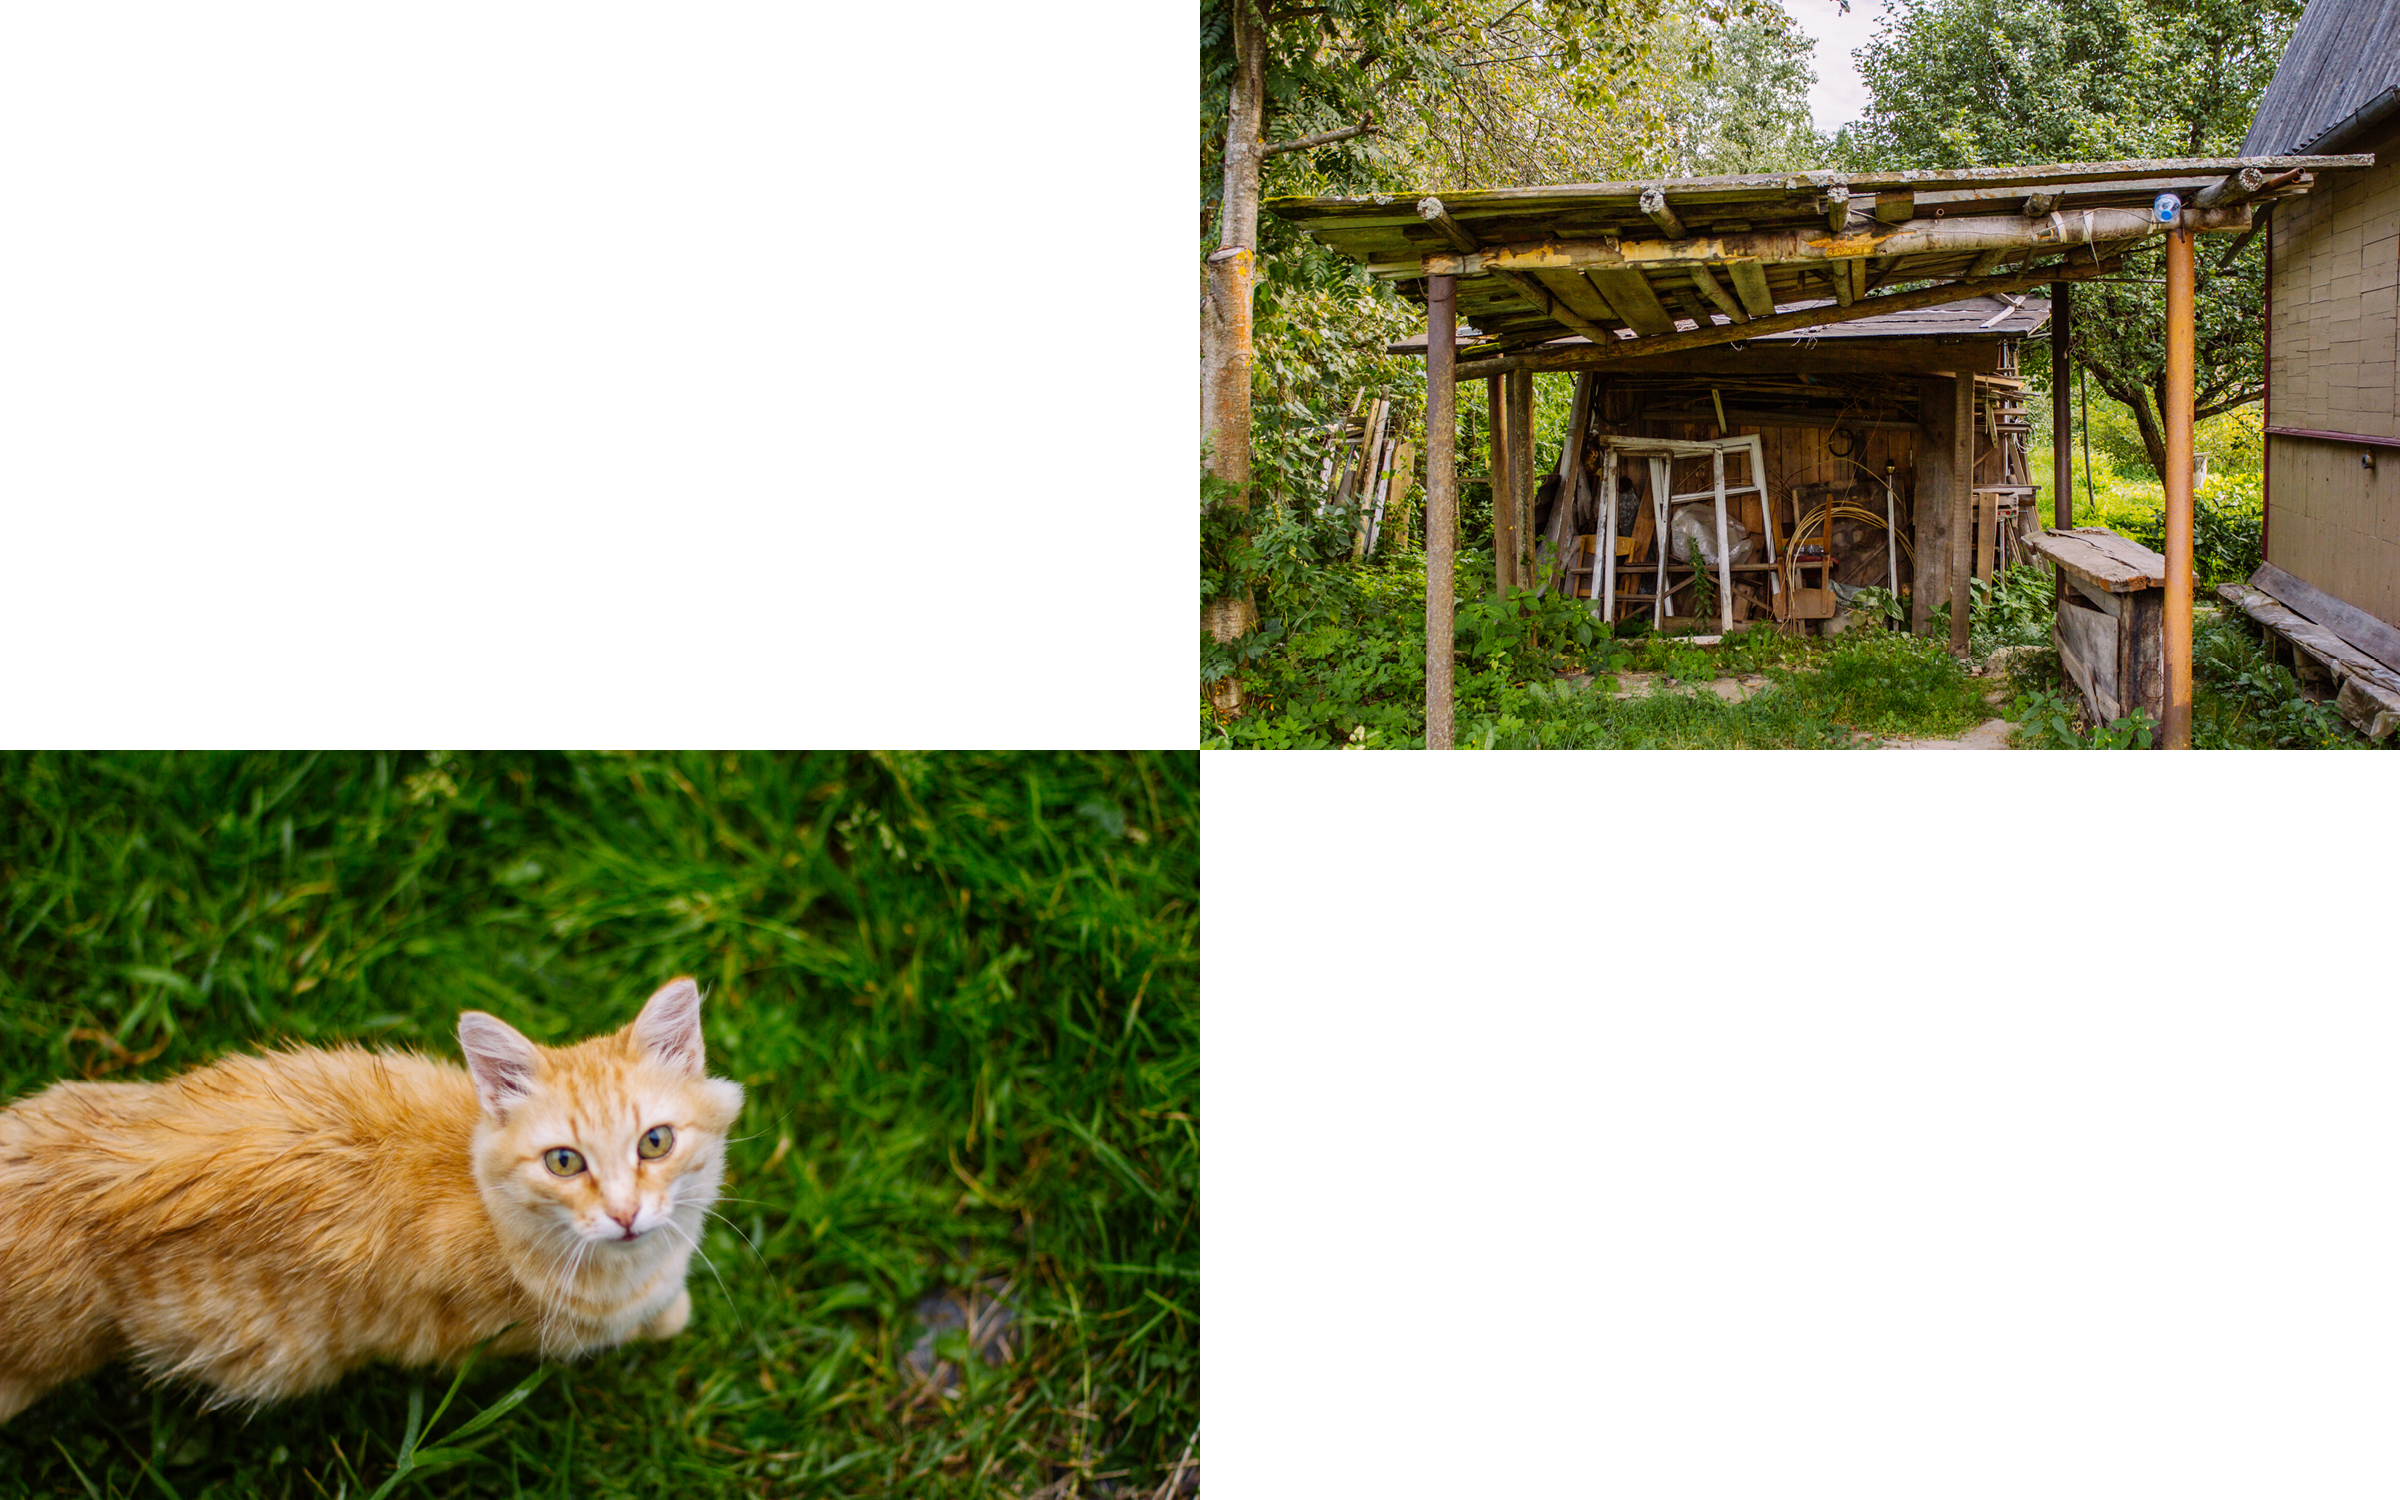 Kovtun_013_Russia_Photo_Book.jpg